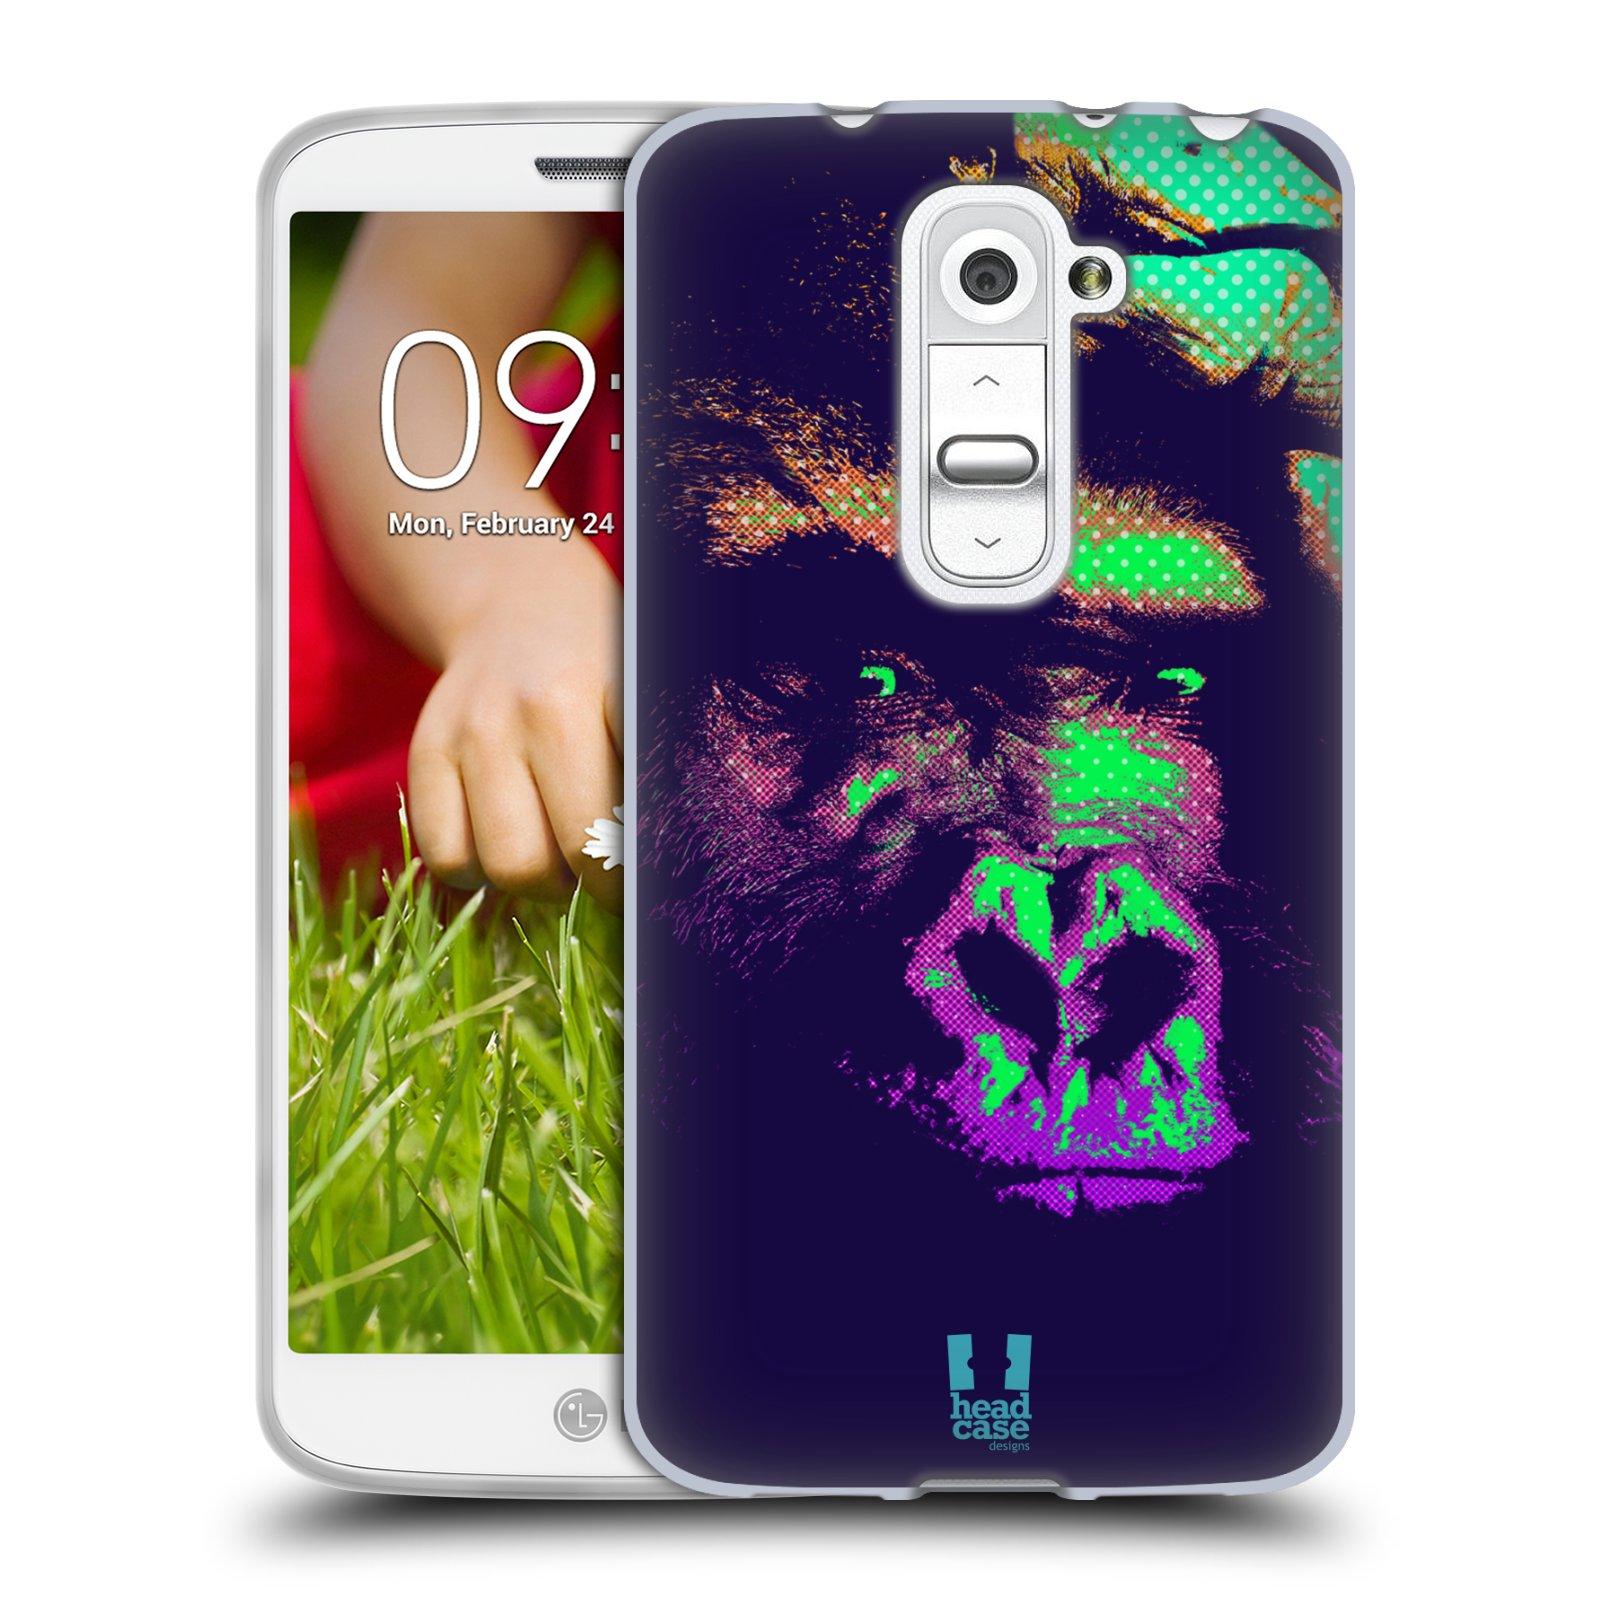 Silikonové pouzdro na mobil LG G2 Mini HEAD CASE POP PRINT GORILA (Silikonový kryt či obal na mobilní telefon LG G2 Mini D620)